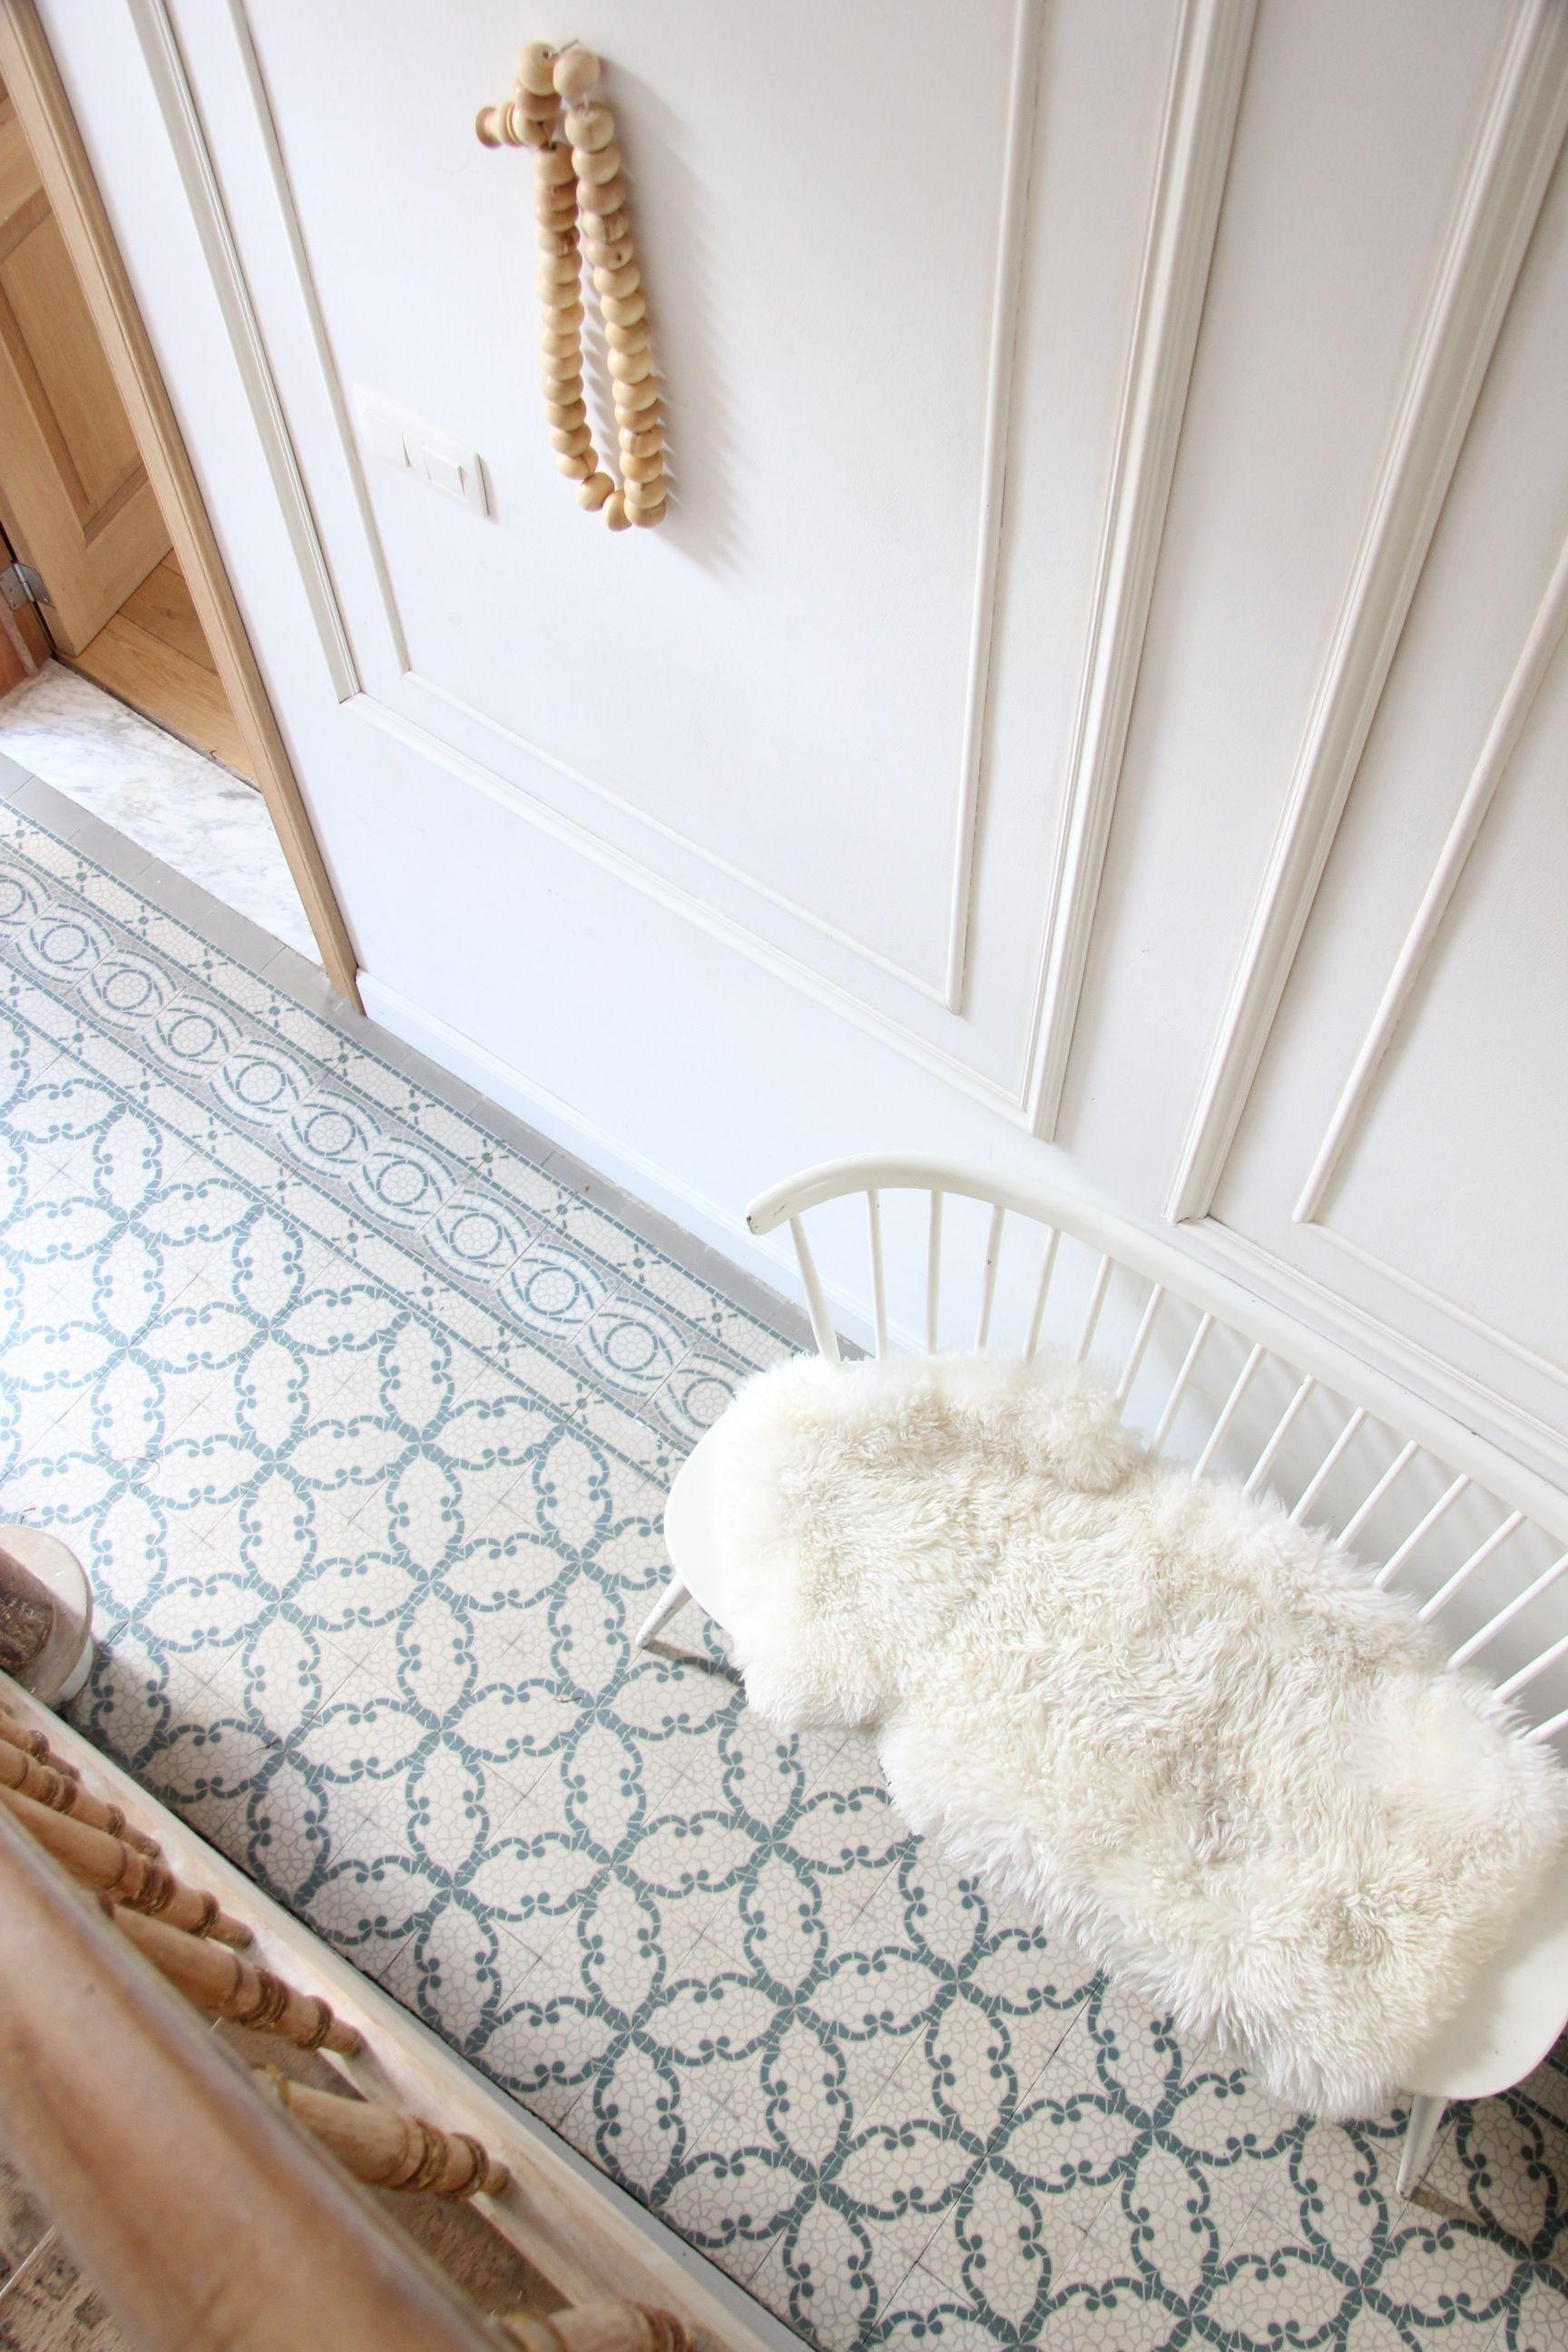 Nice 1 Inch Hexagon Floor Tiles Huge 12X24 Floor Tile Shaped 13X13 Ceramic Tile 2X4 Subway Tile Young 4 Tile Patterns For Floors Red6 X 12 White Subway Tile 4 Idées Pour Bien Aménager Son Entrée | Minimalist, Staircases And ..